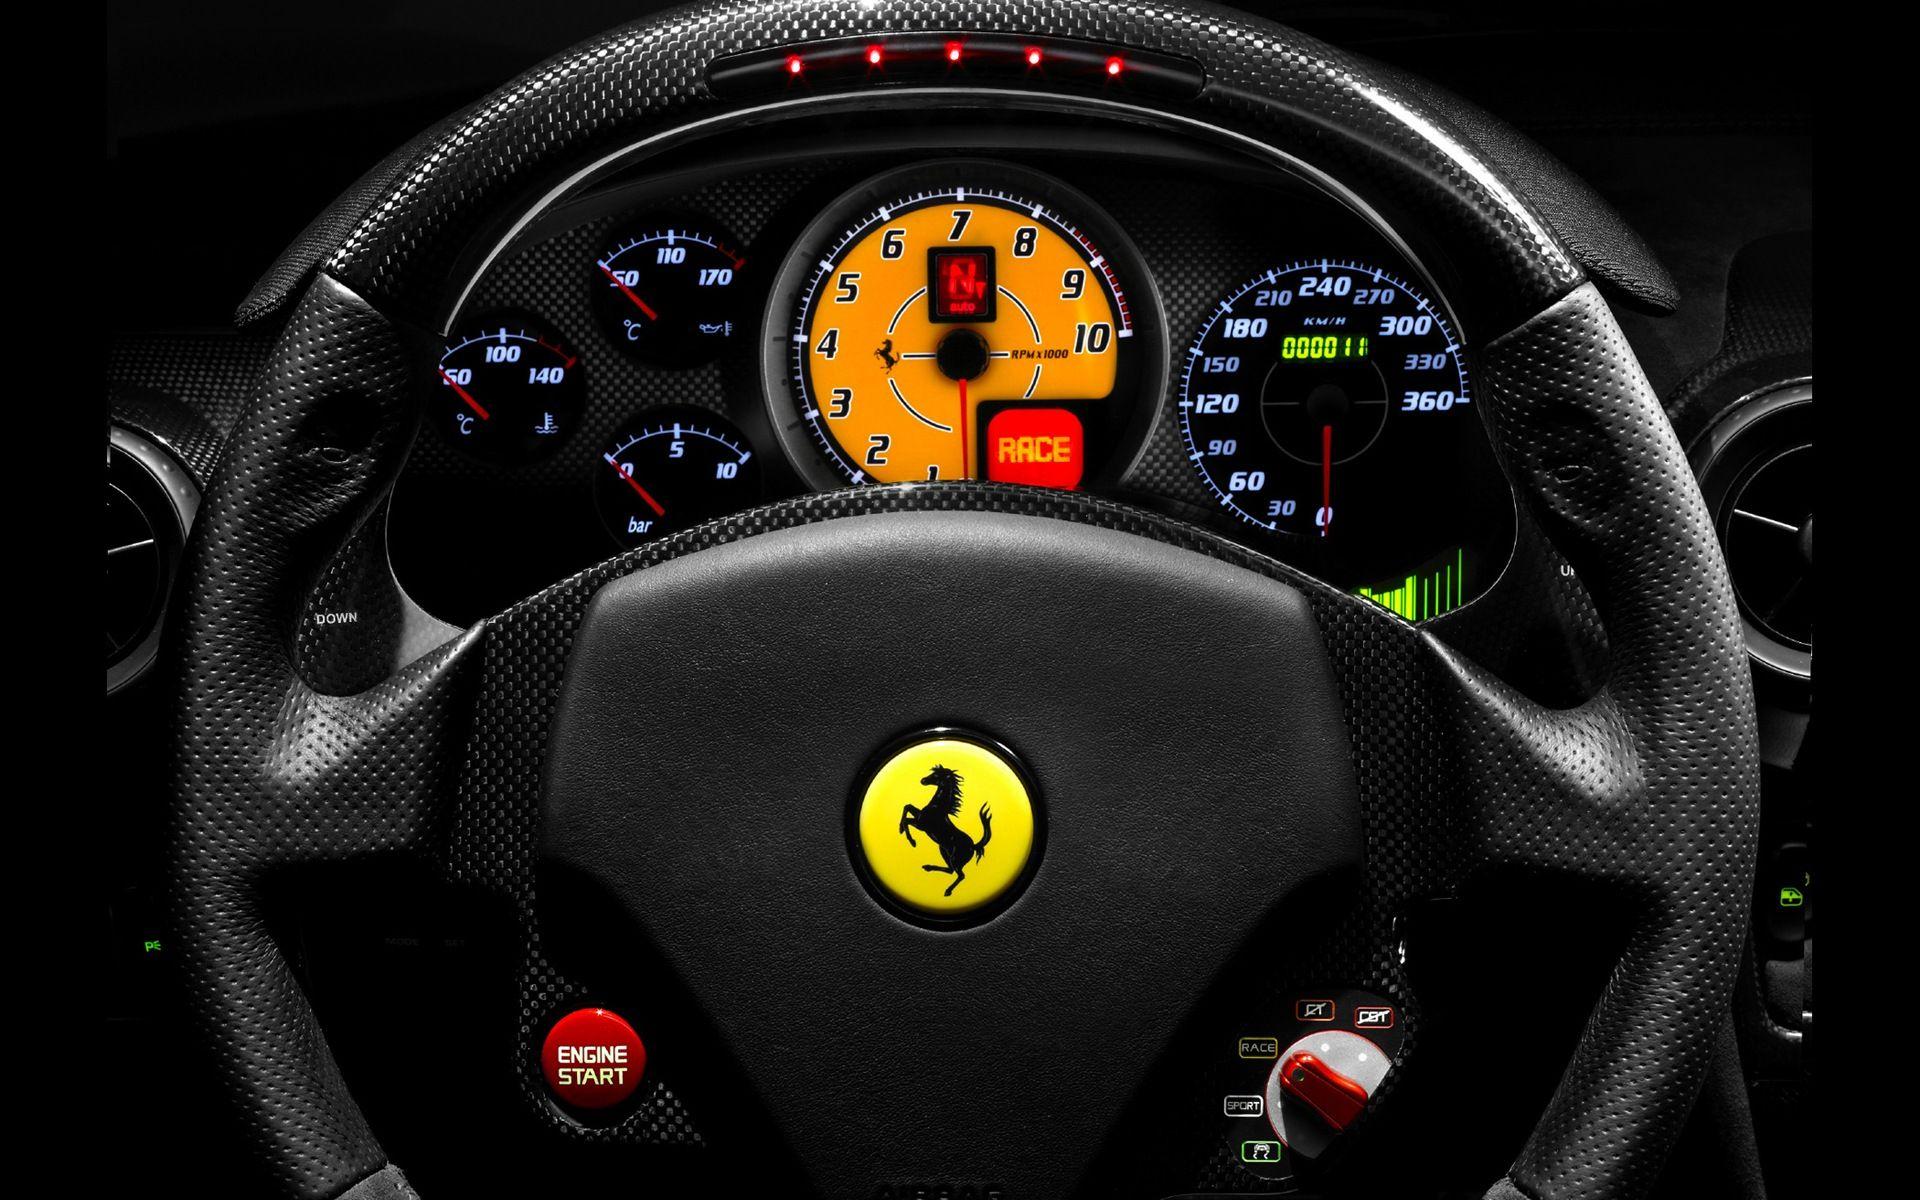 Ferrari F Scuderia Steering Wheel And Dashboard Ferrari Car Ferrari F430 Ferrari